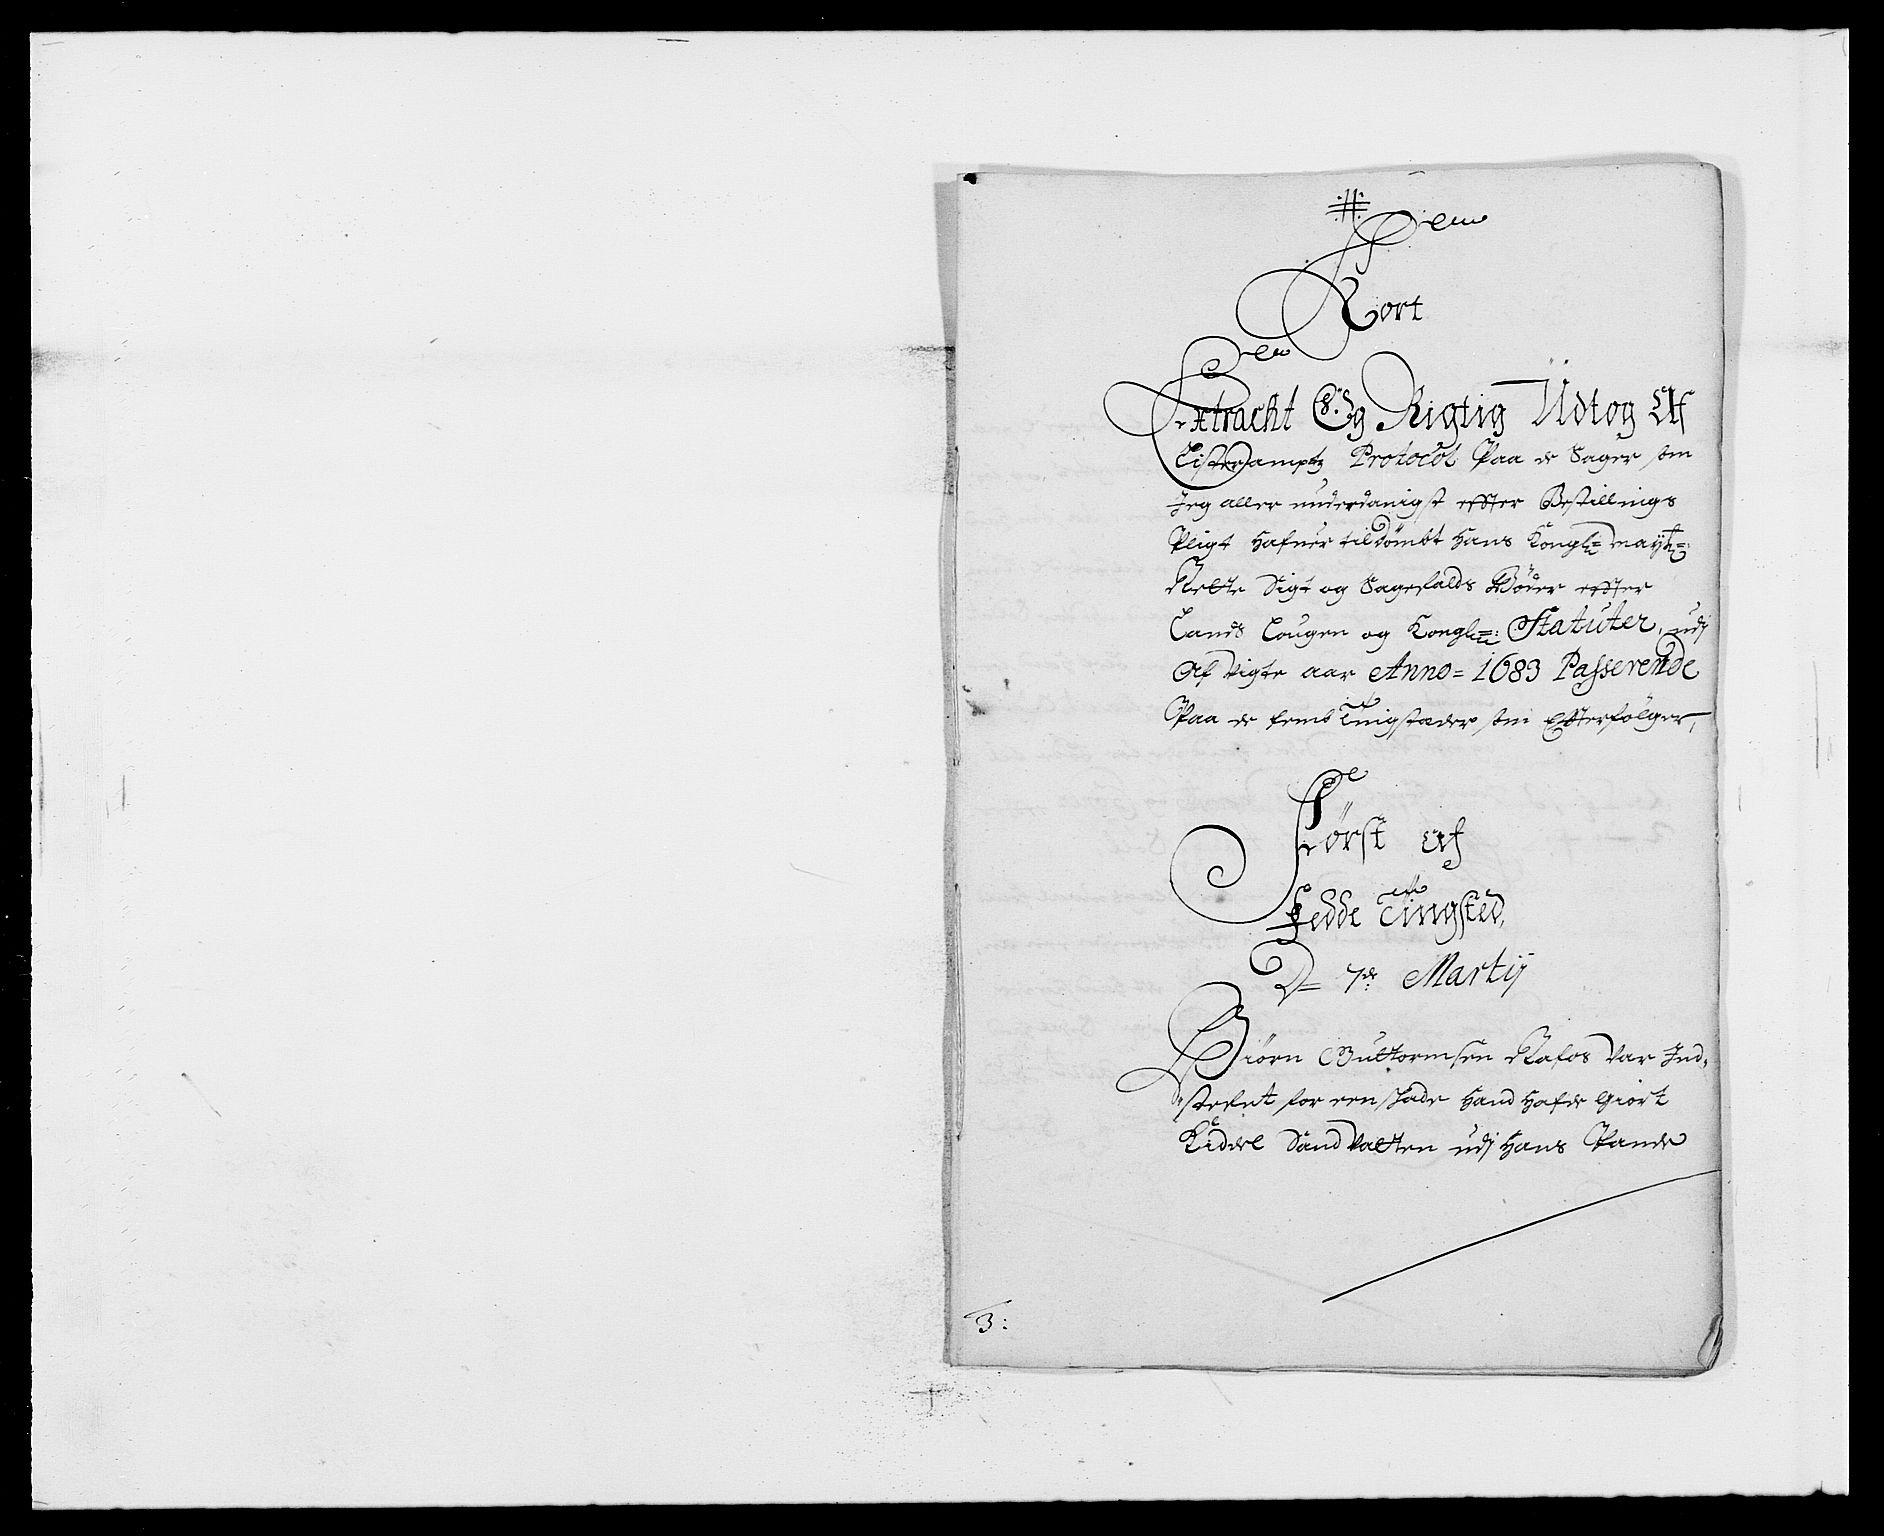 RA, Rentekammeret inntil 1814, Reviderte regnskaper, Fogderegnskap, R41/L2532: Fogderegnskap Lista, 1683, s. 49